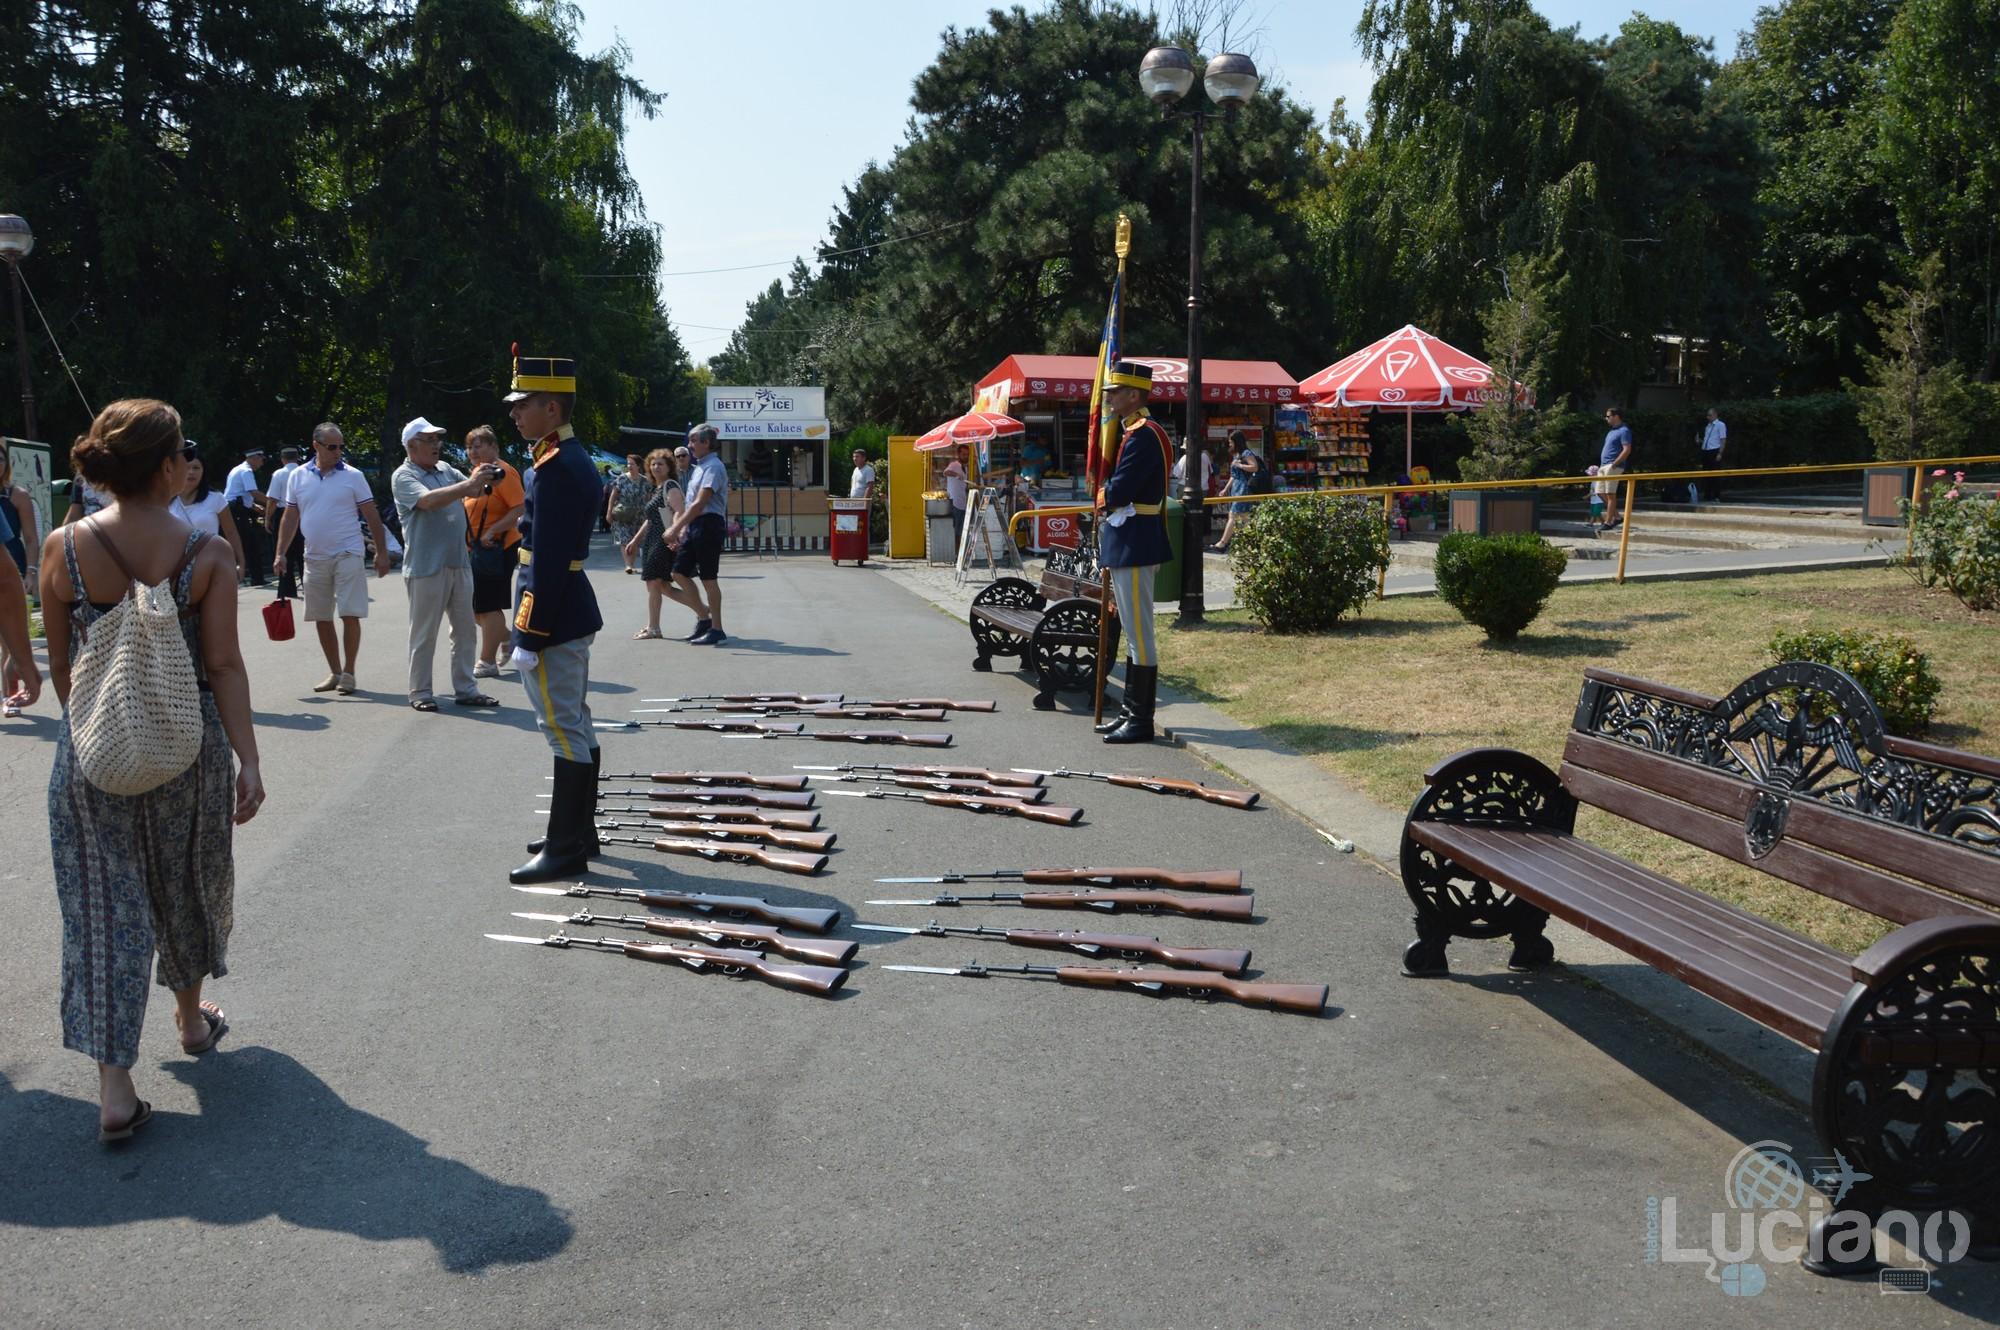 monumento ai caduti King Michael I Park - Parcul Regele Mihai I al României